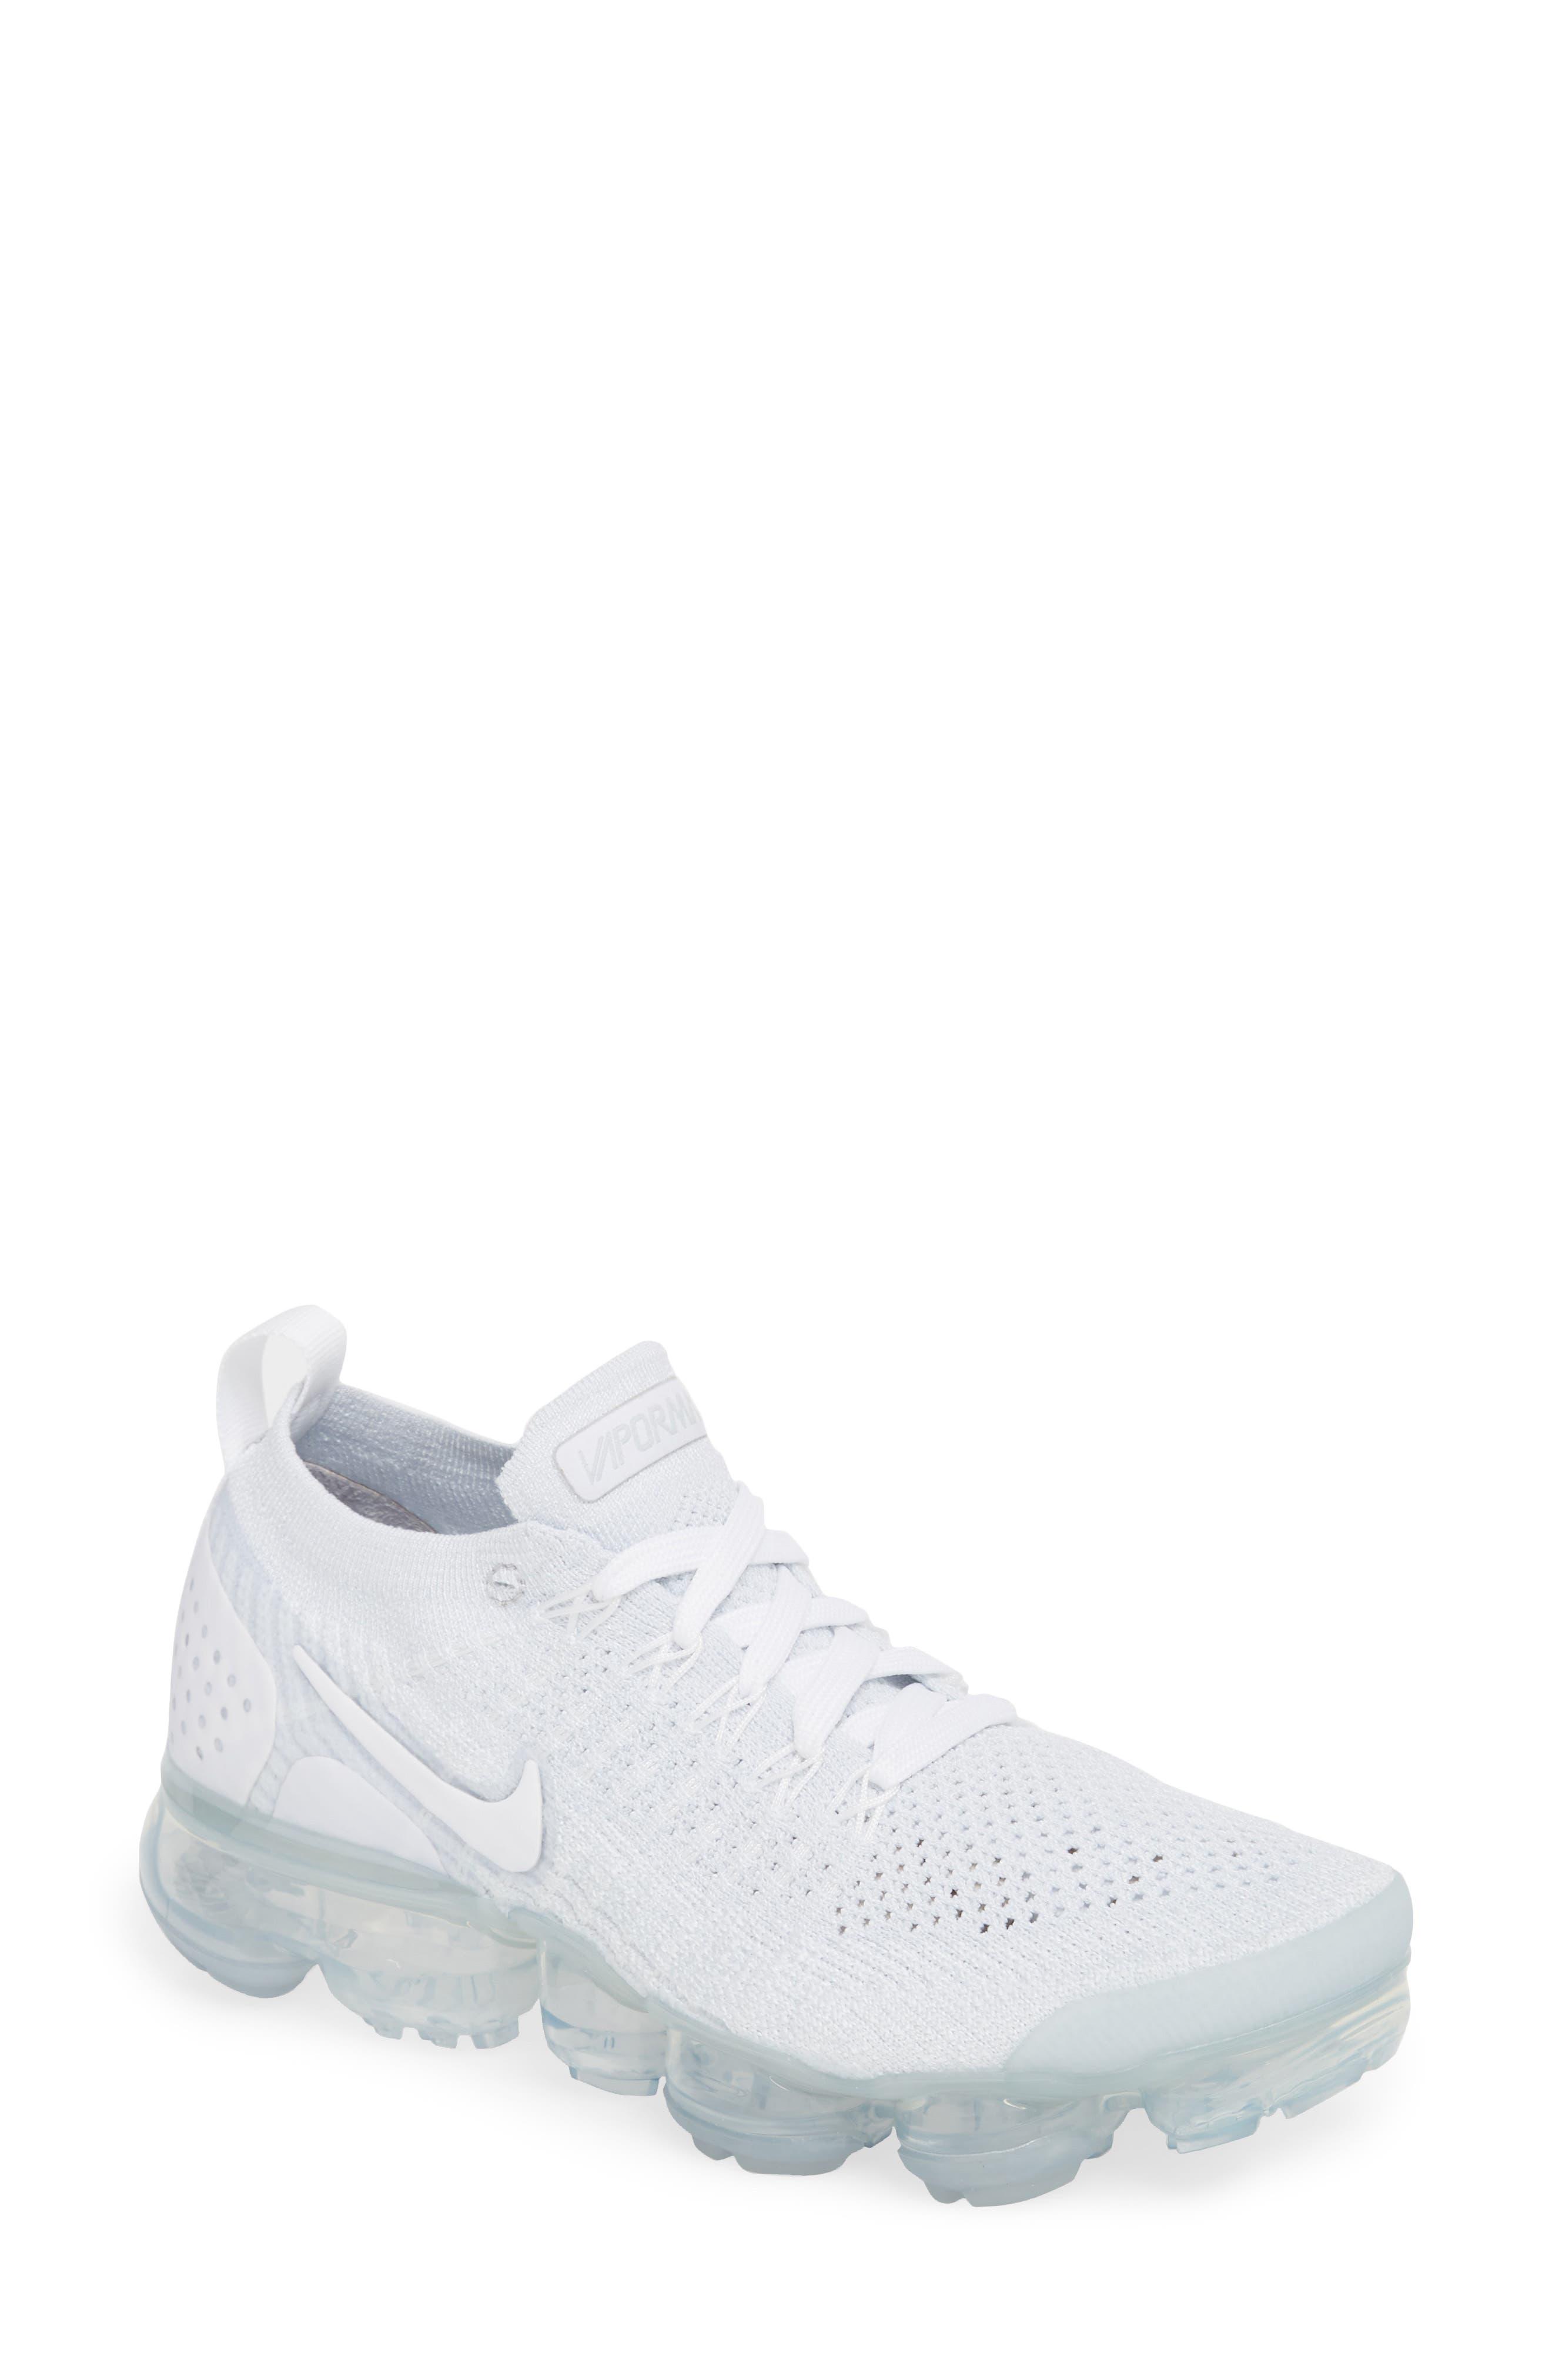 nike air vapormax flyknit 2 scarpa da corsa, bianco / bianco / puro